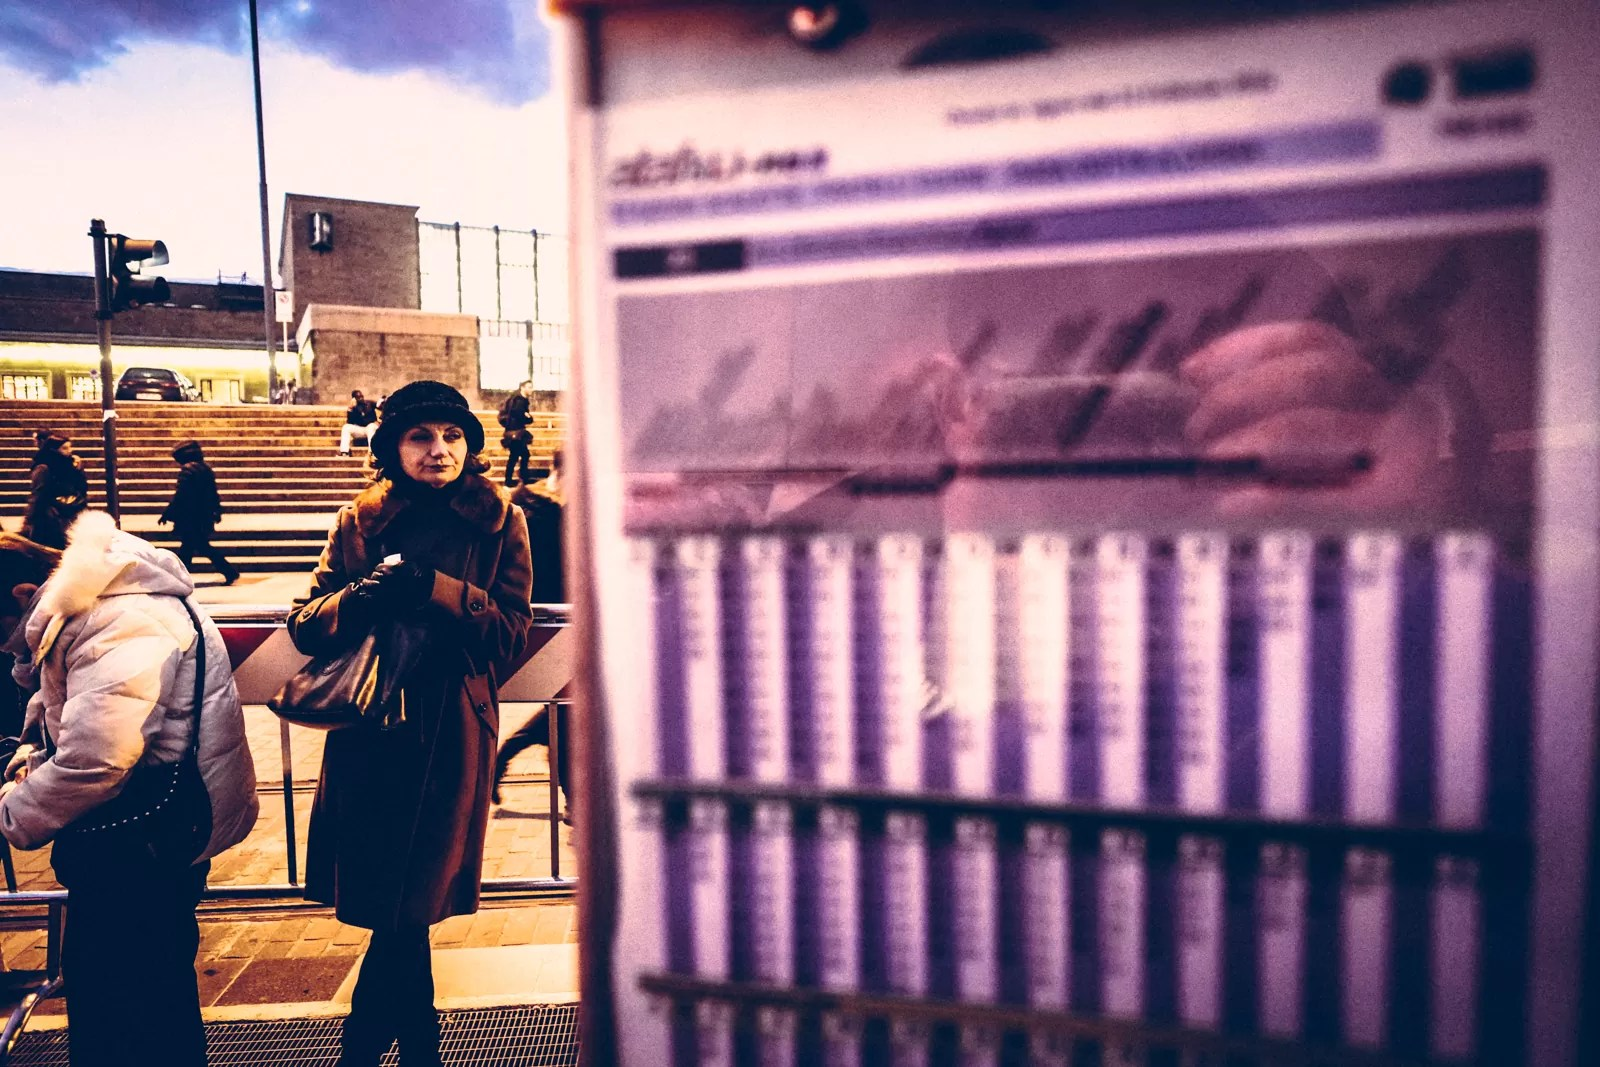 DSCF7828 - Foto fatte a c...? - Pensieri condivisi sulla street photography - fotostreet.it